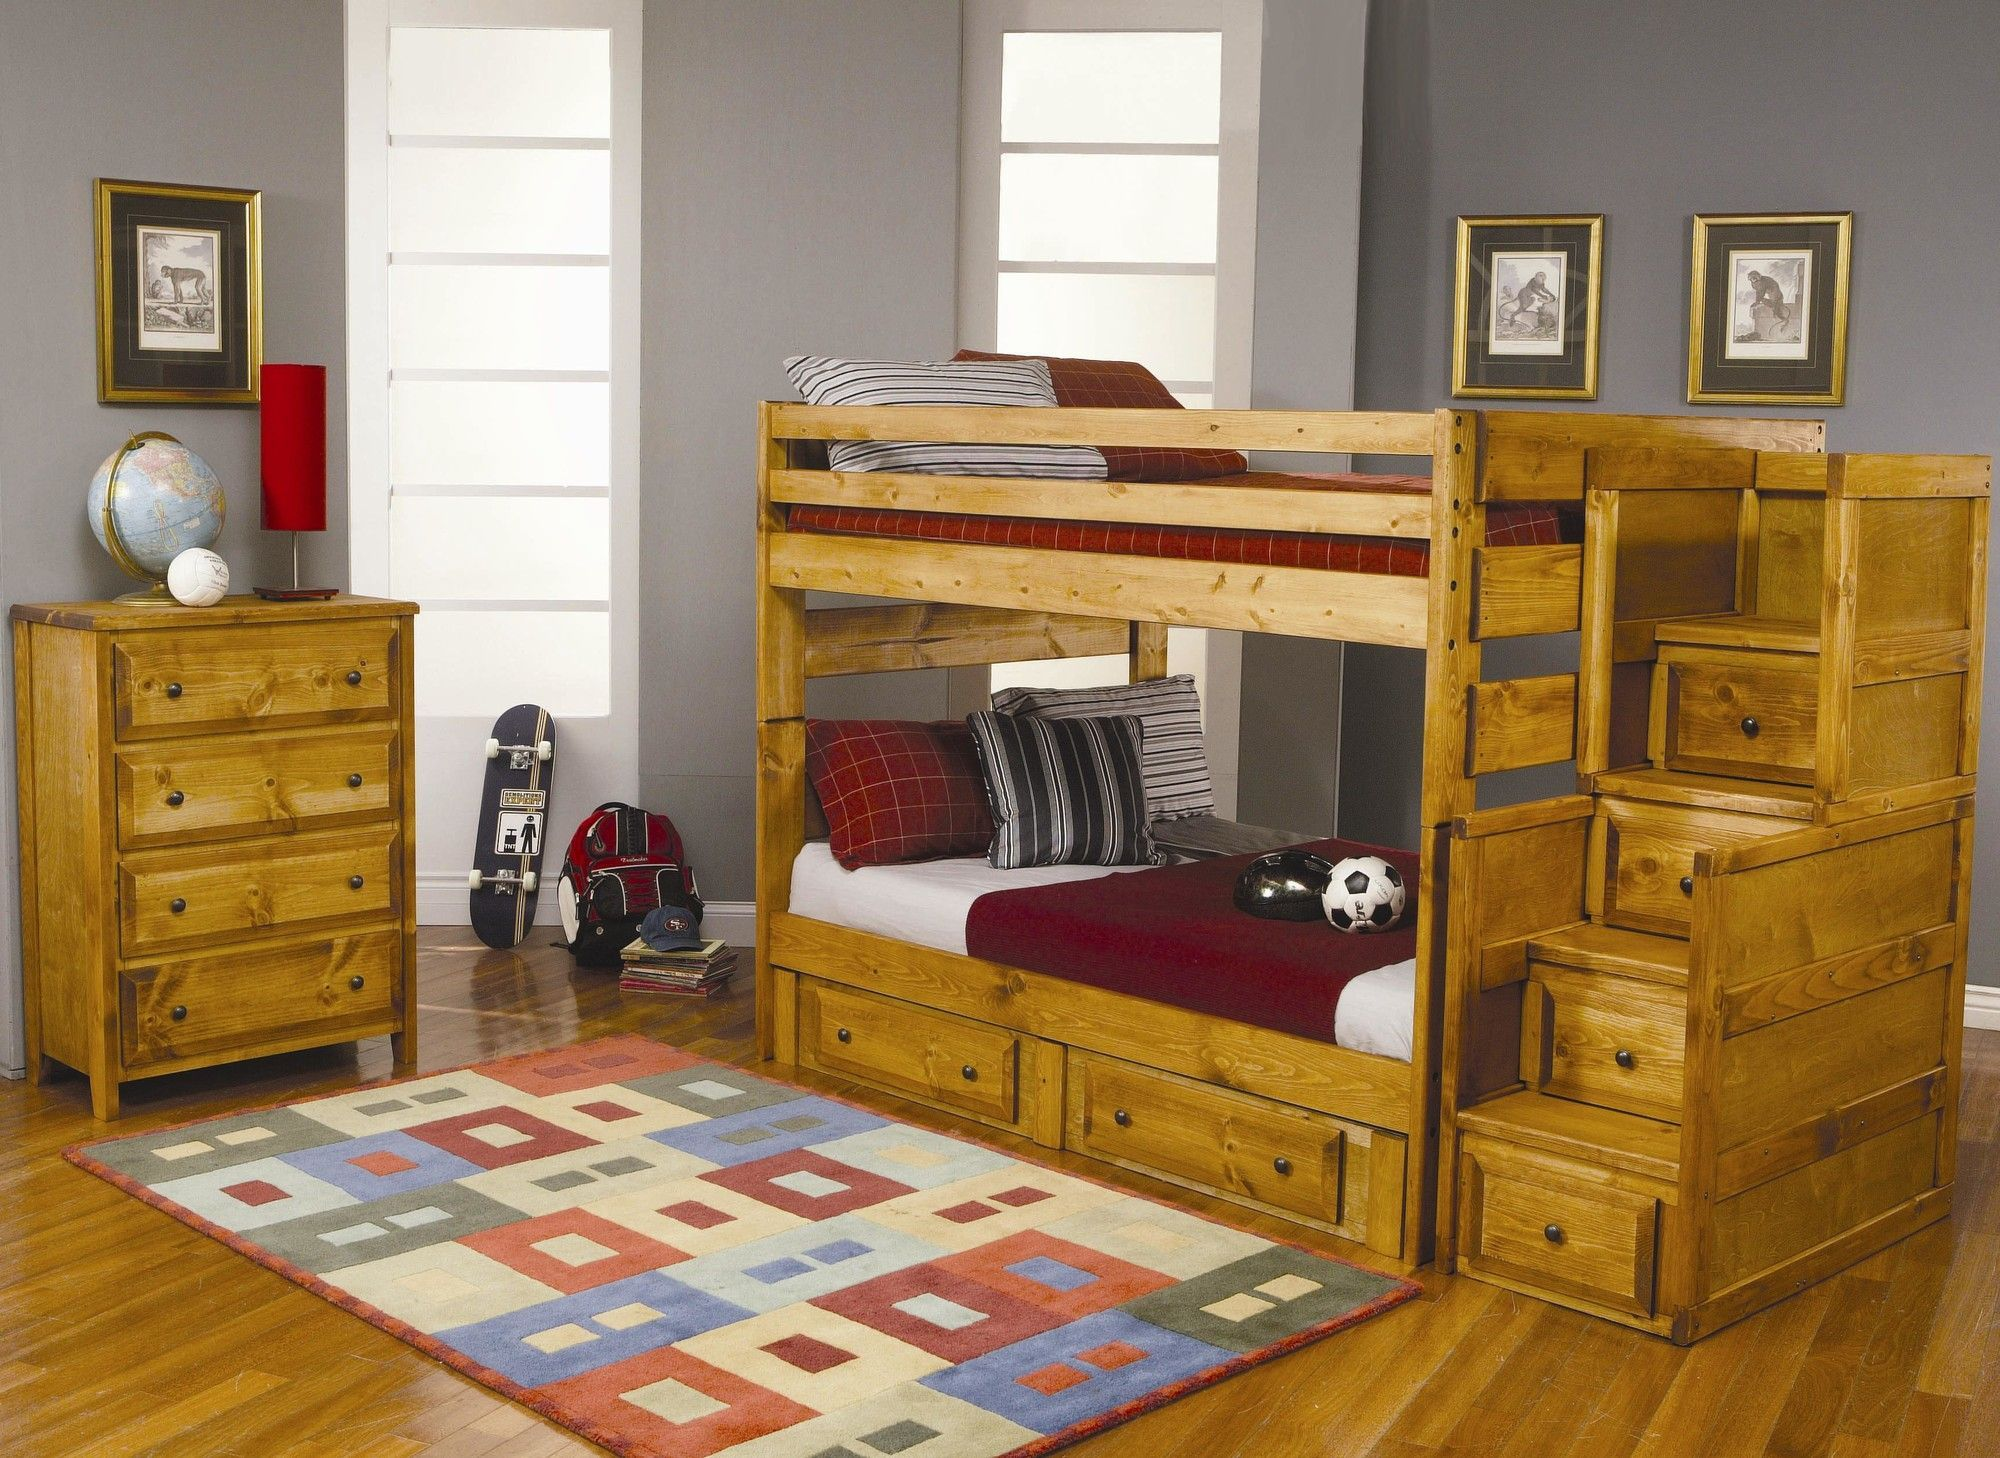 San Bernardino Drawer Chest Bunk Bed with Stairs Pinterest